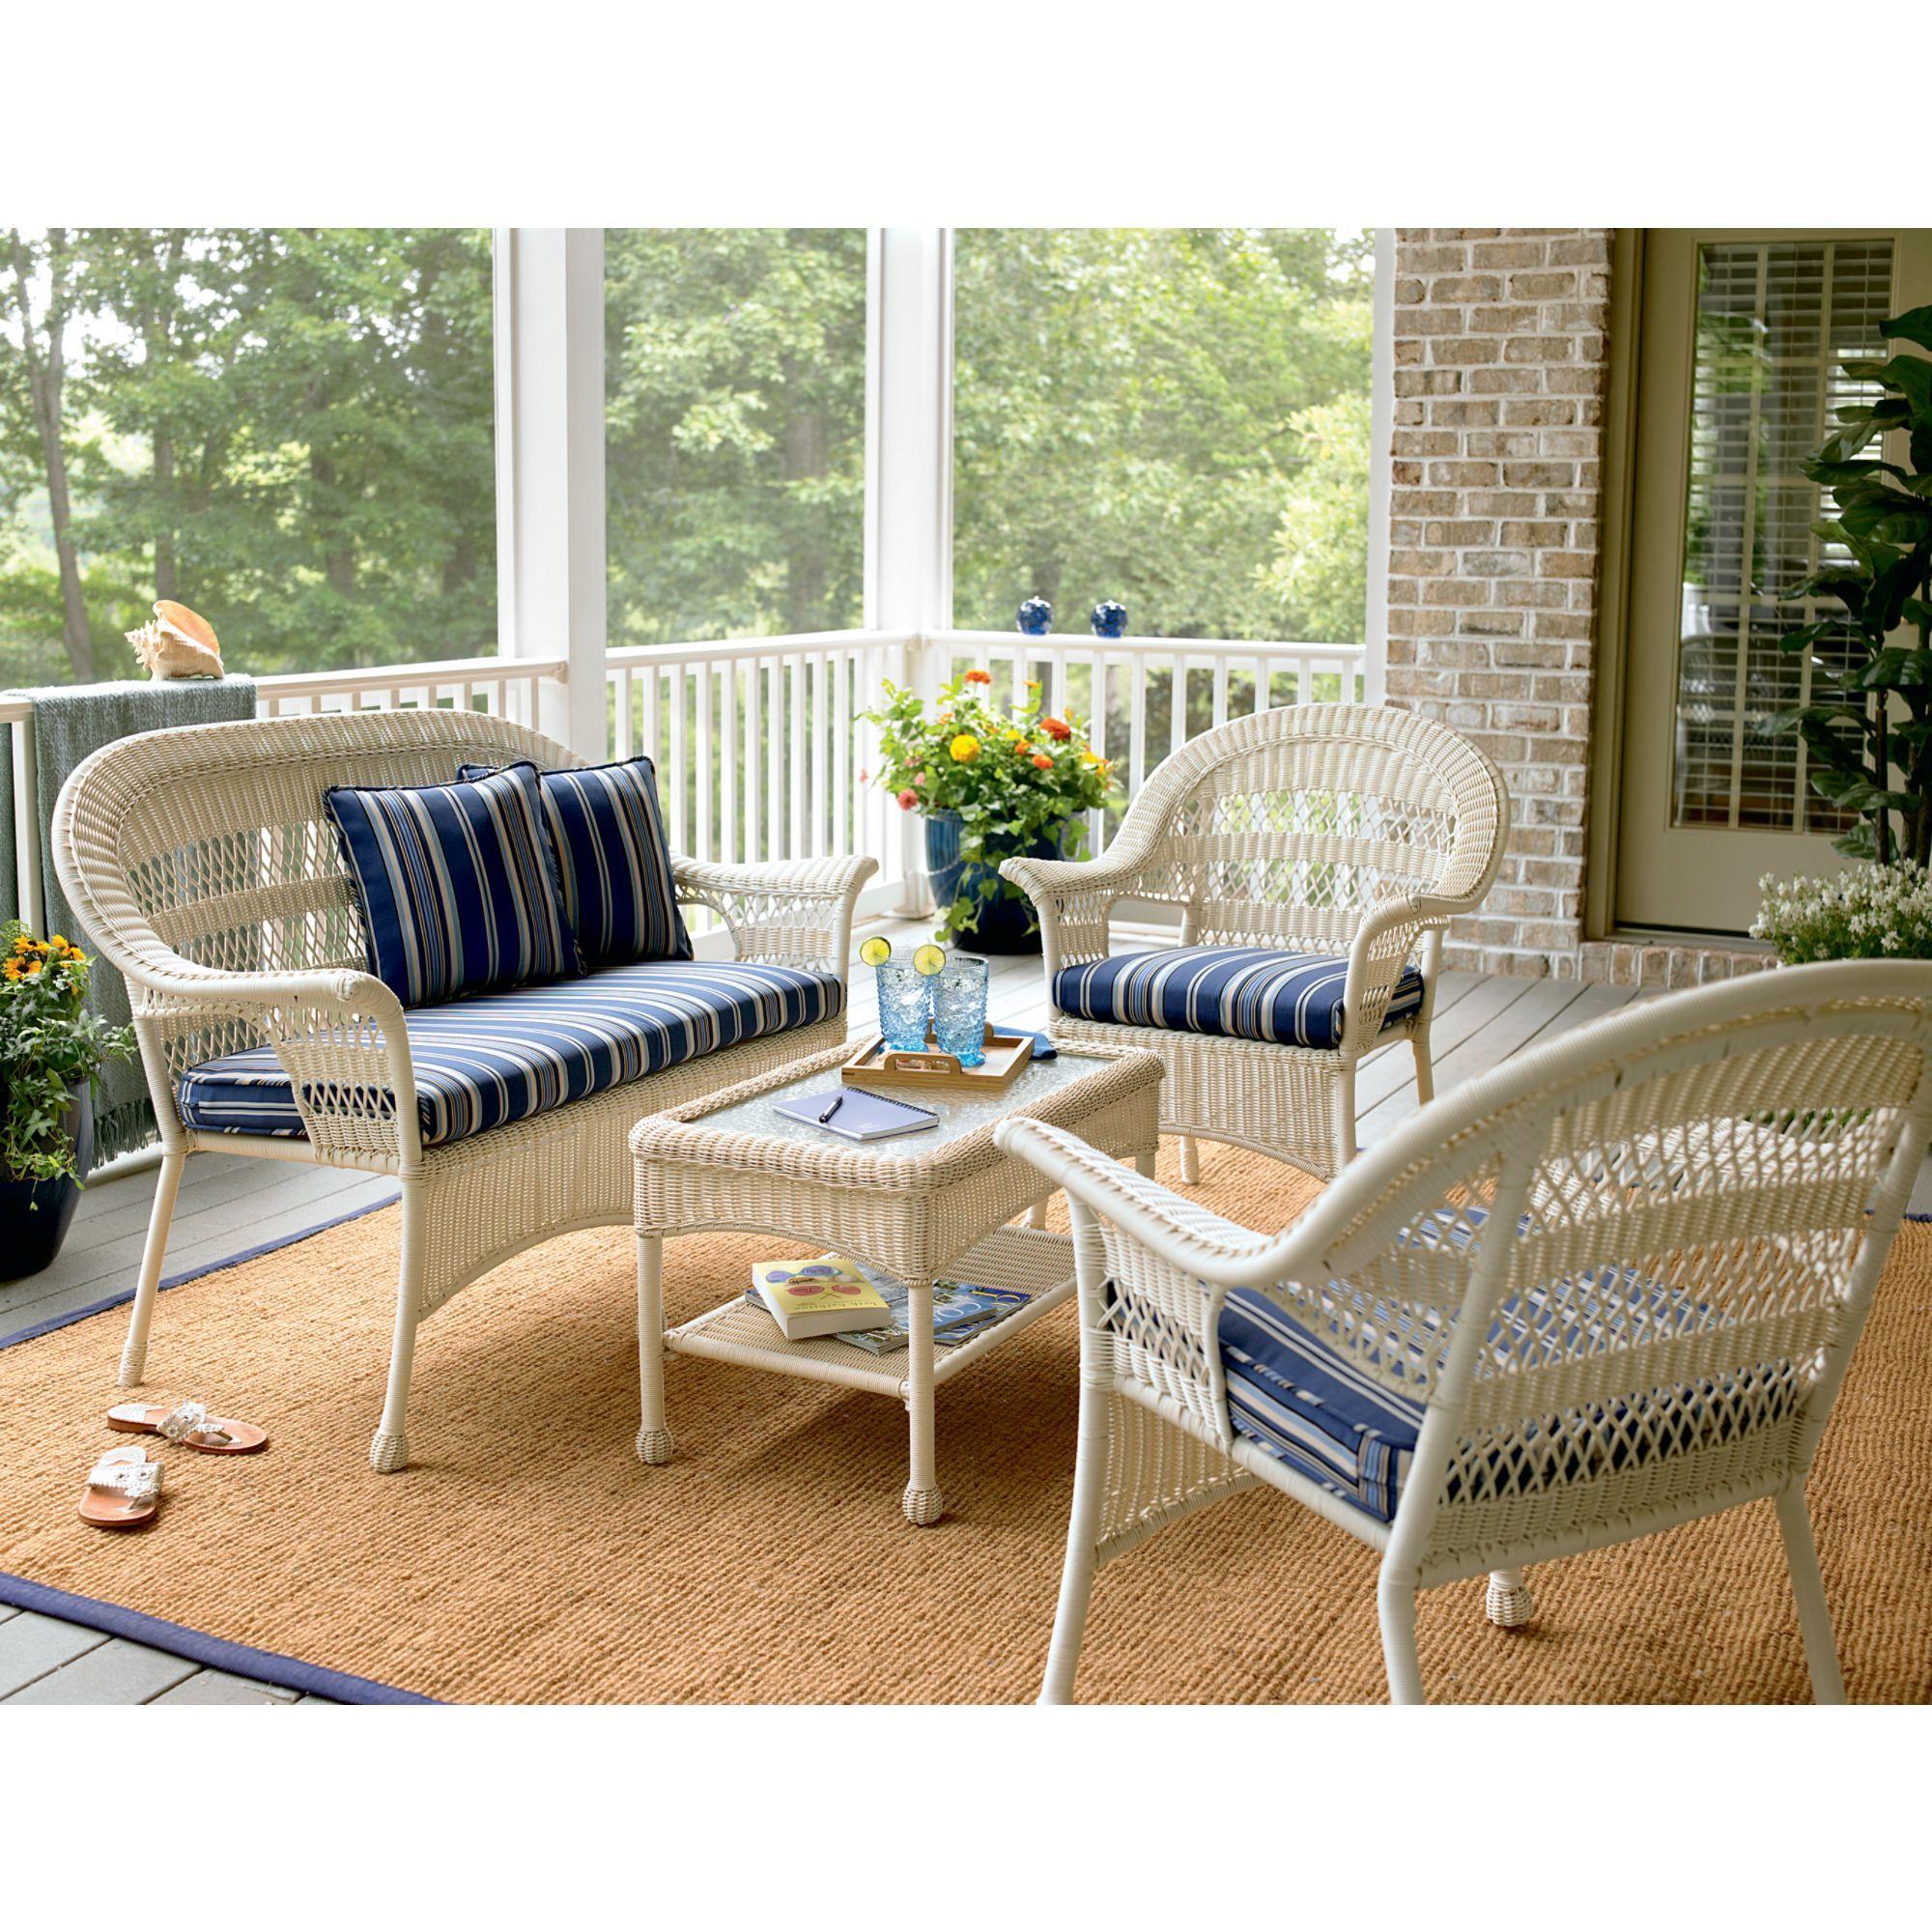 grand resort shorewood 4 piece outdoor seating set 474 99 rh pinterest com